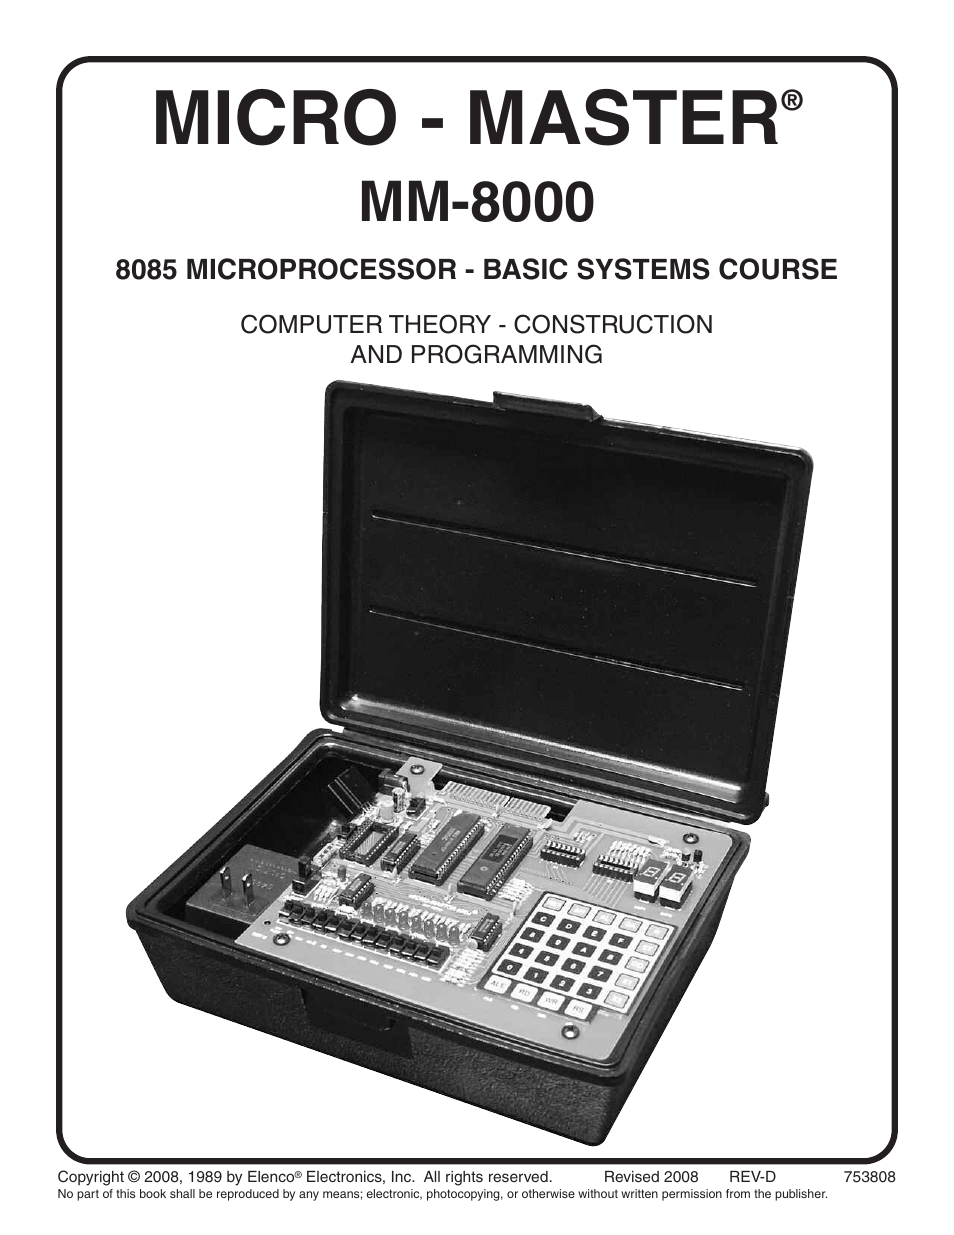 Elenco MM-8000 Micro-Master Computer Theory Trainer Education ...